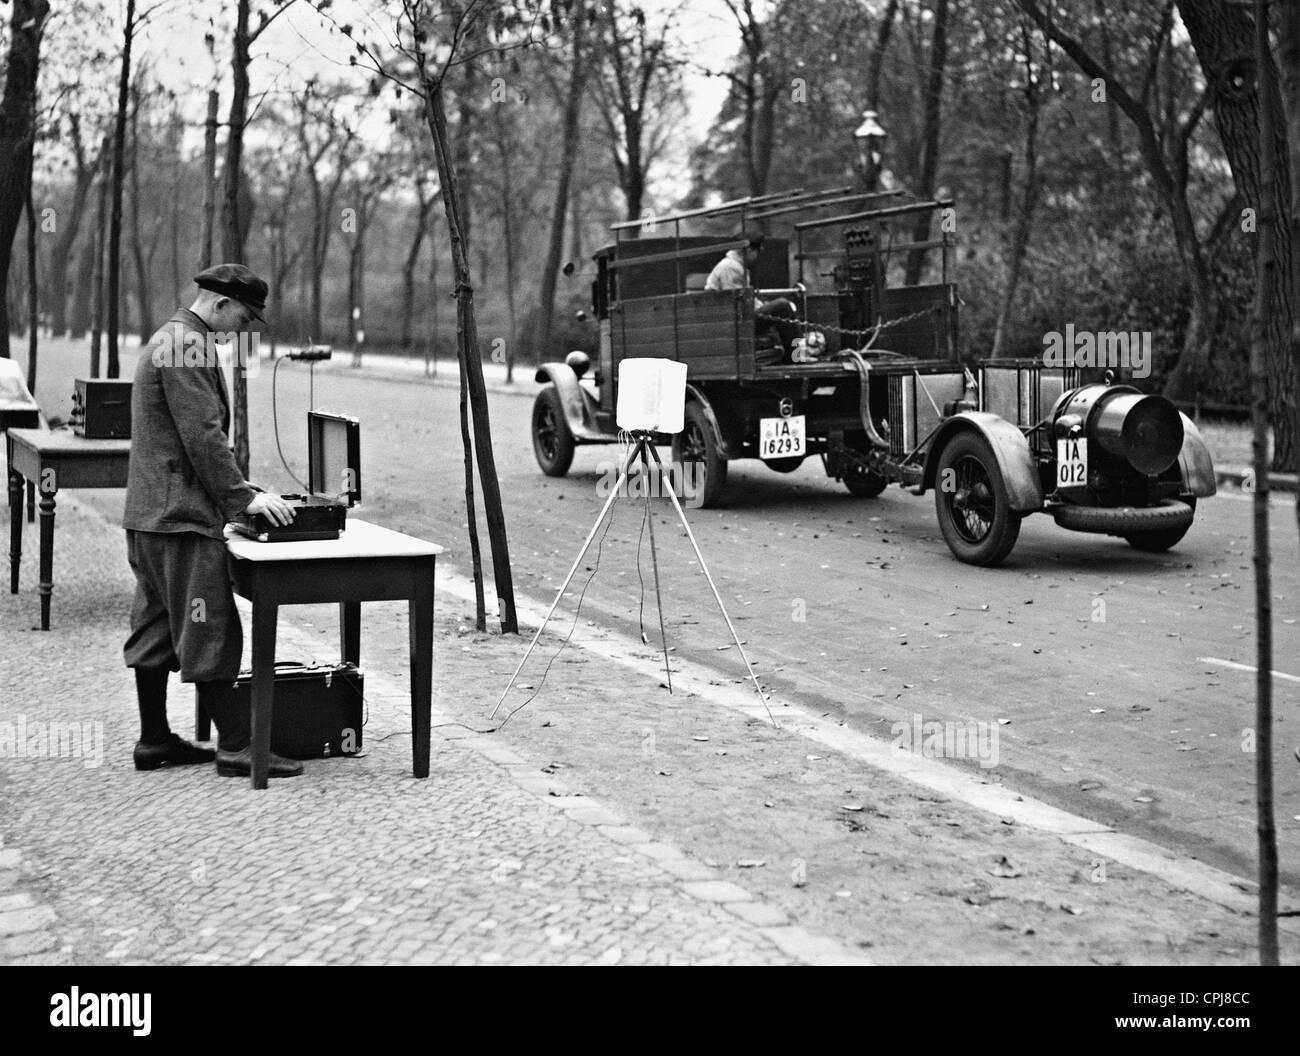 Traffic noise measurement, 1934 Stock Photo: 48344924 - Alamy